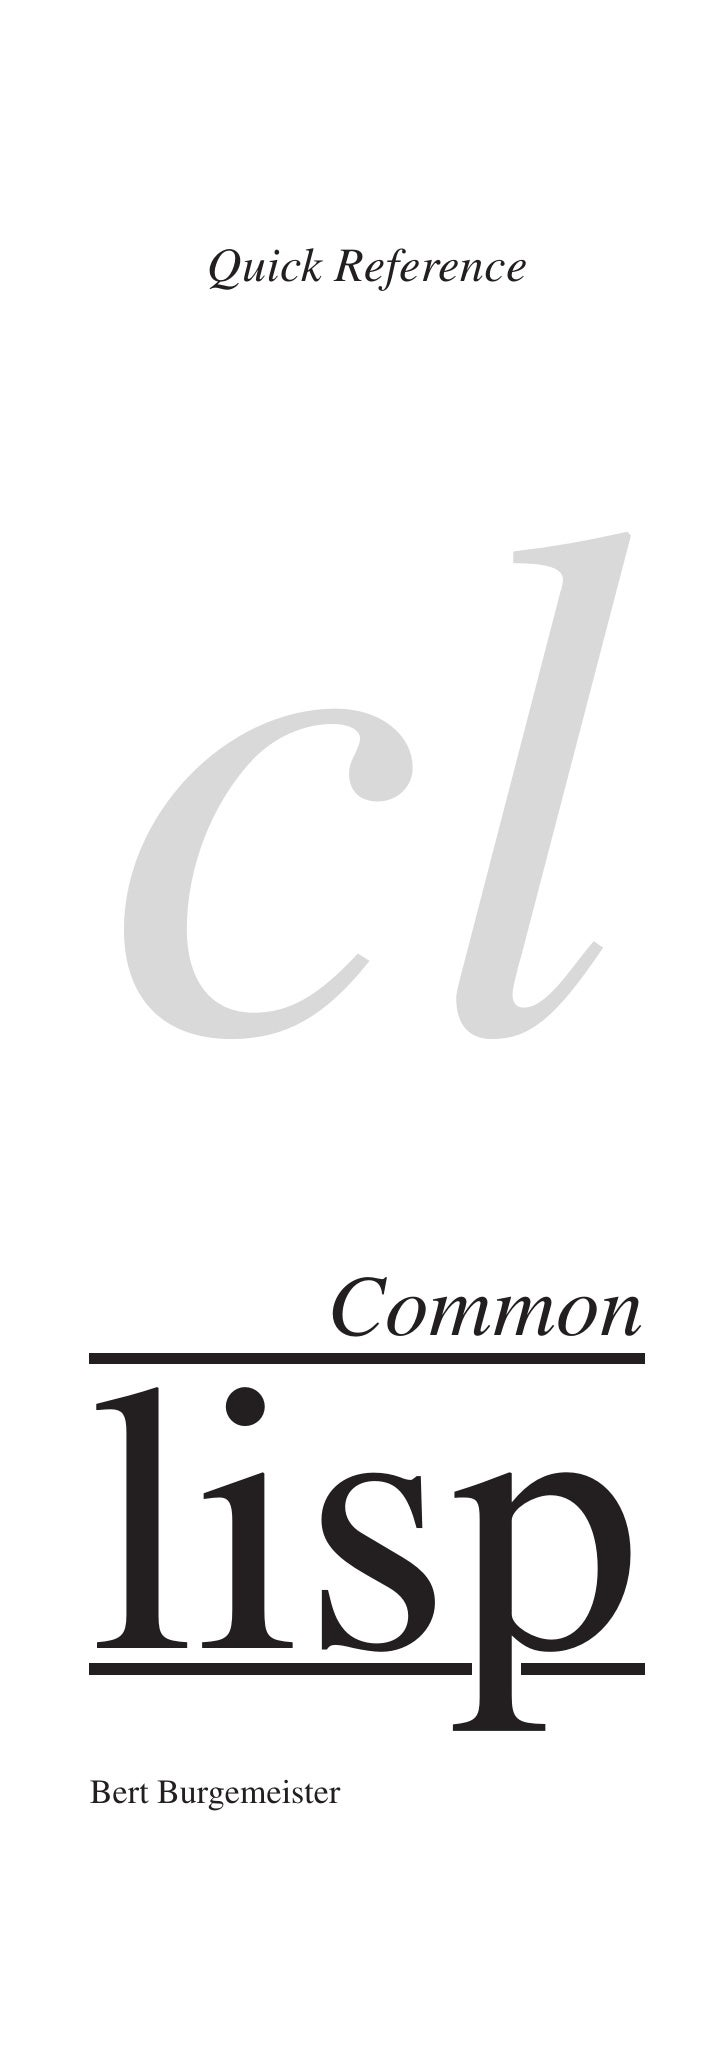 Quick Referencecl              CommonlispBert Burgemeister